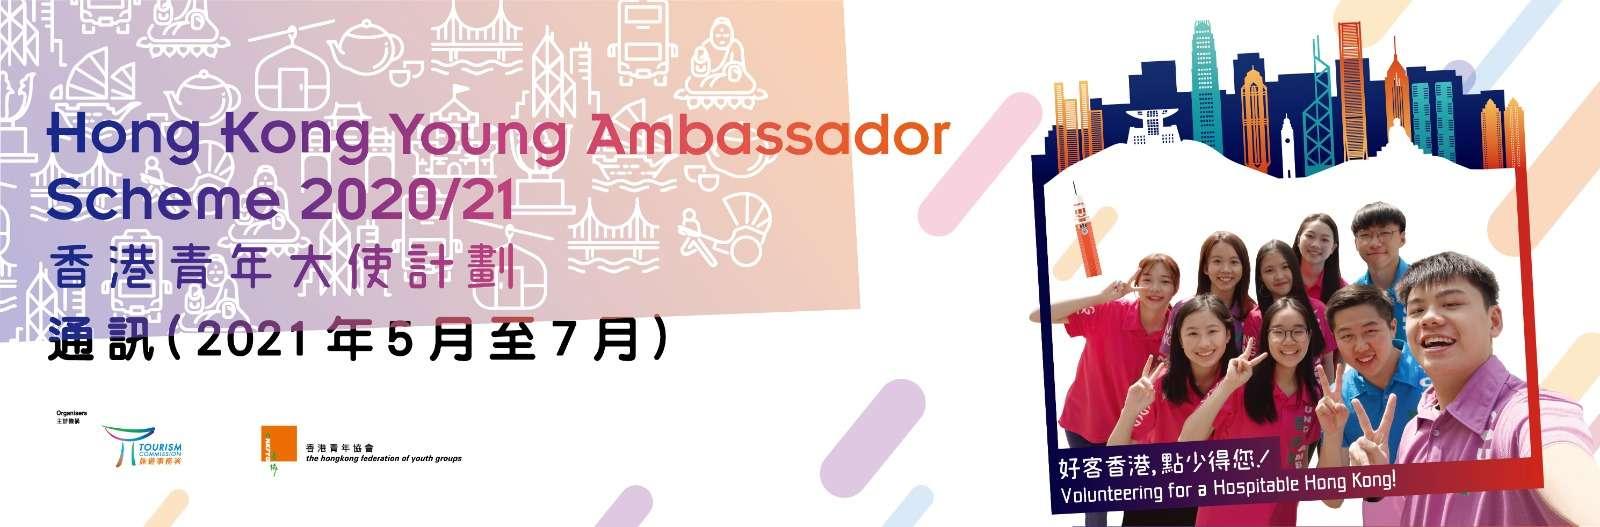 yas 通訊banner_2021年5月至7月